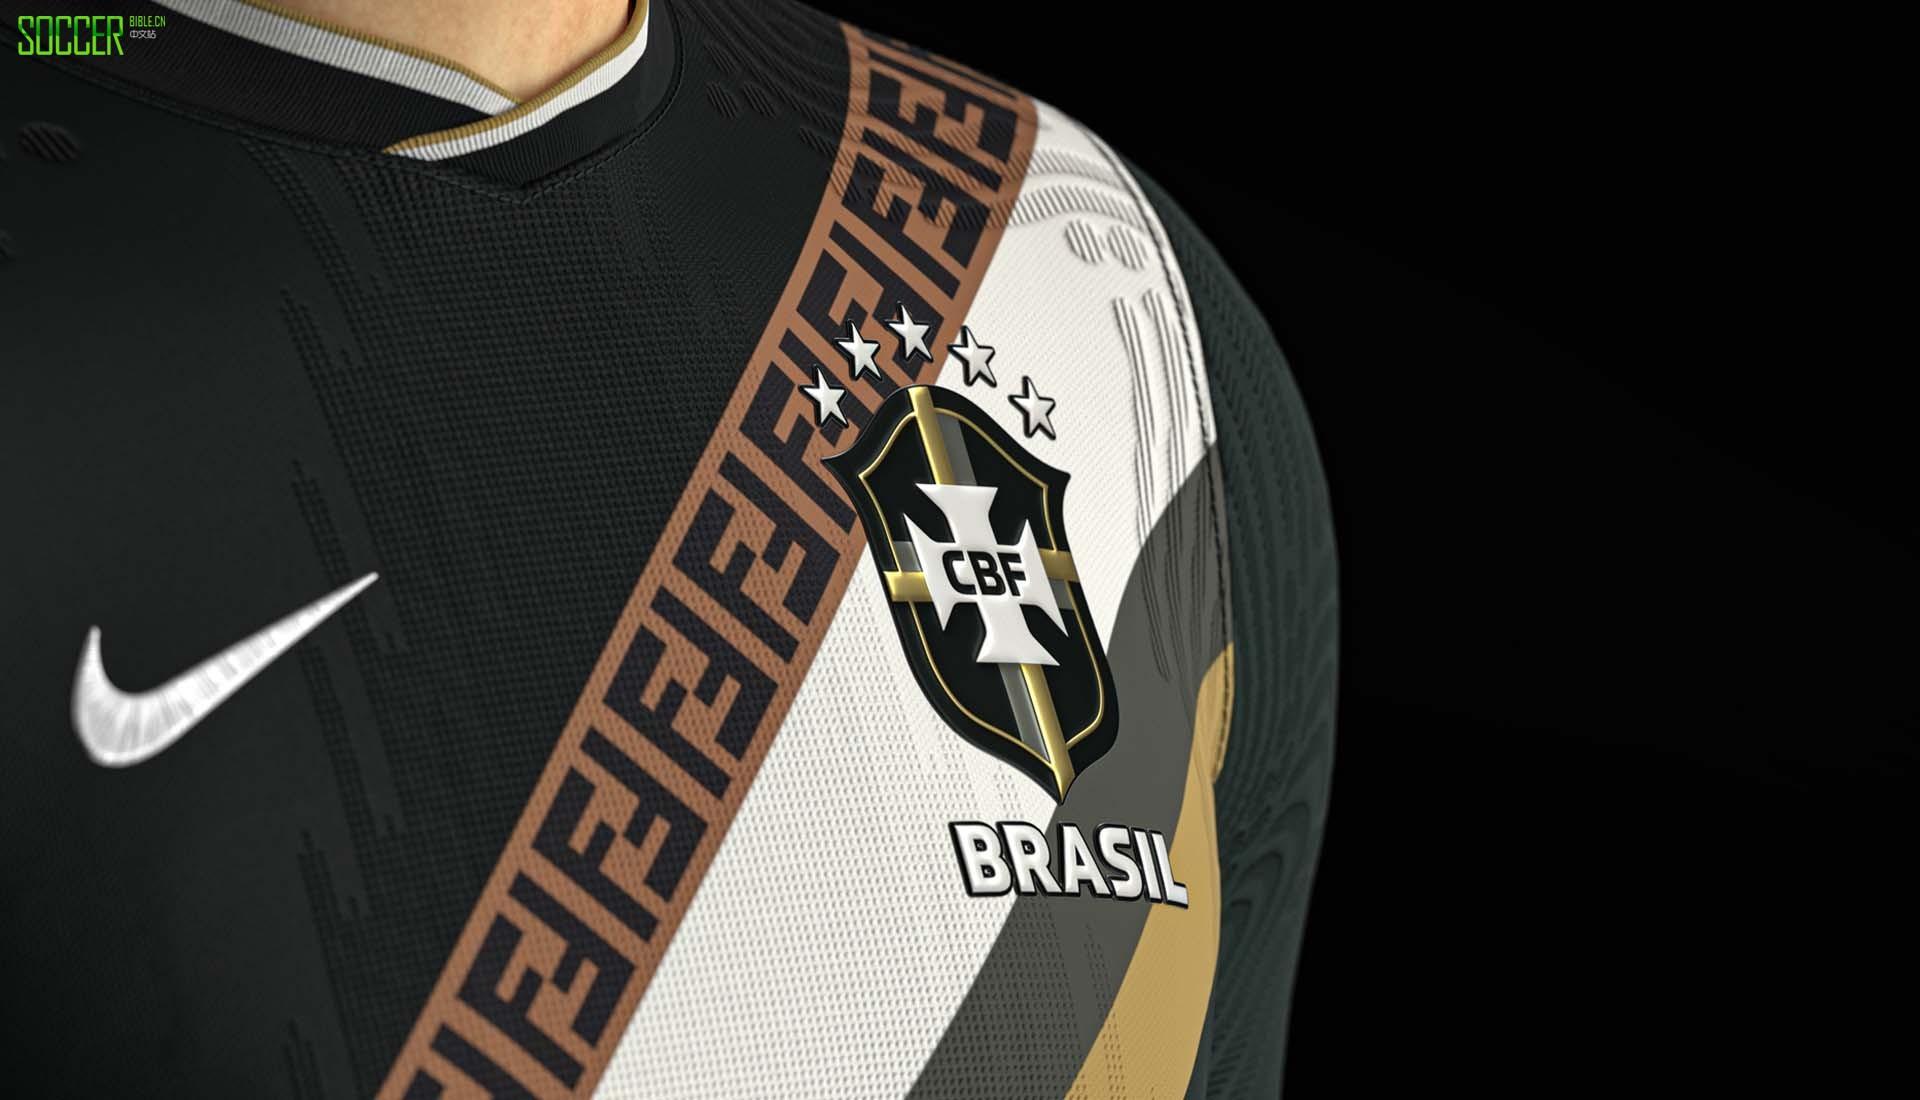 SETTPACE创作巴西国家队 x Fendi 概念球衣